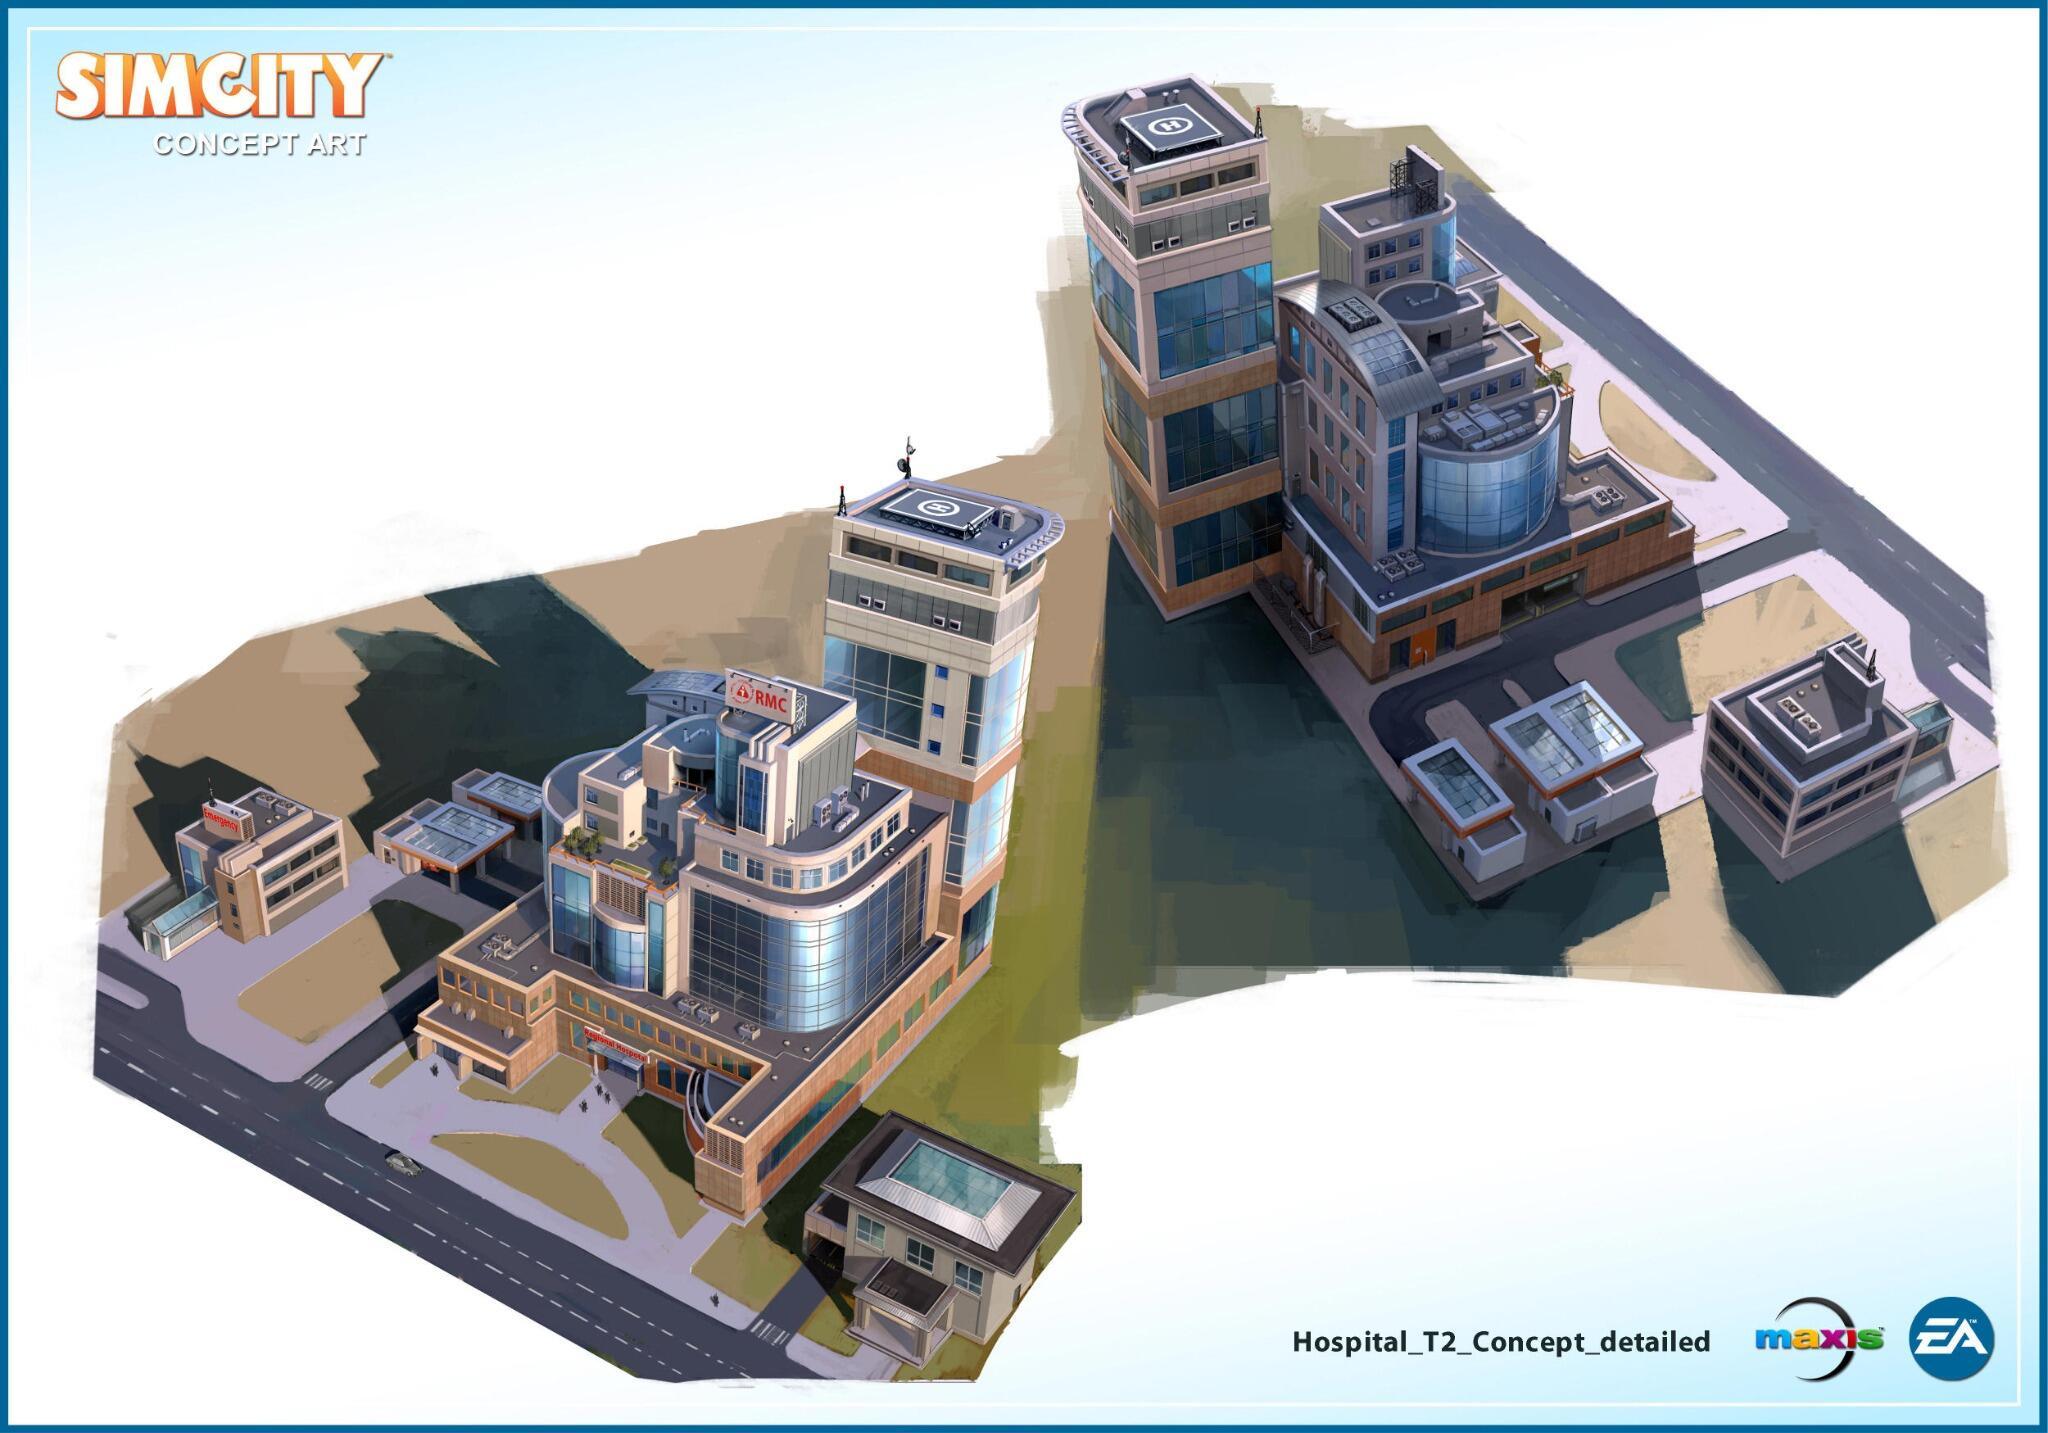 [Imagen]Arte conceptual Simcity (I) BbY80z9CYAAT9gZ